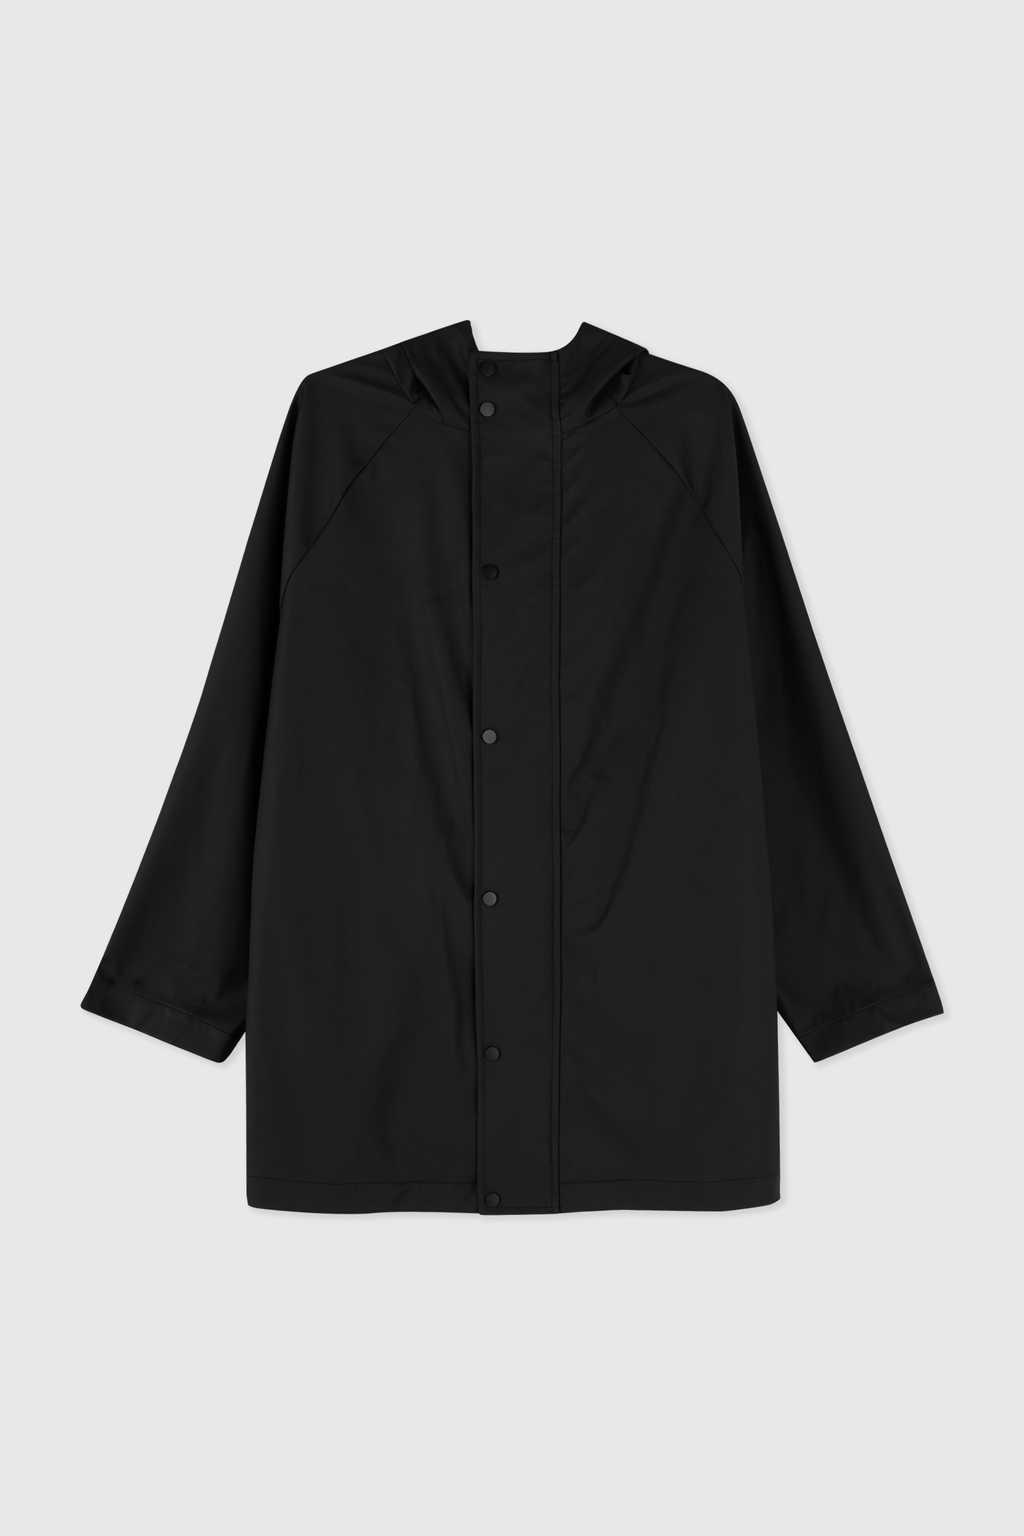 Jacket 3438 Black 12